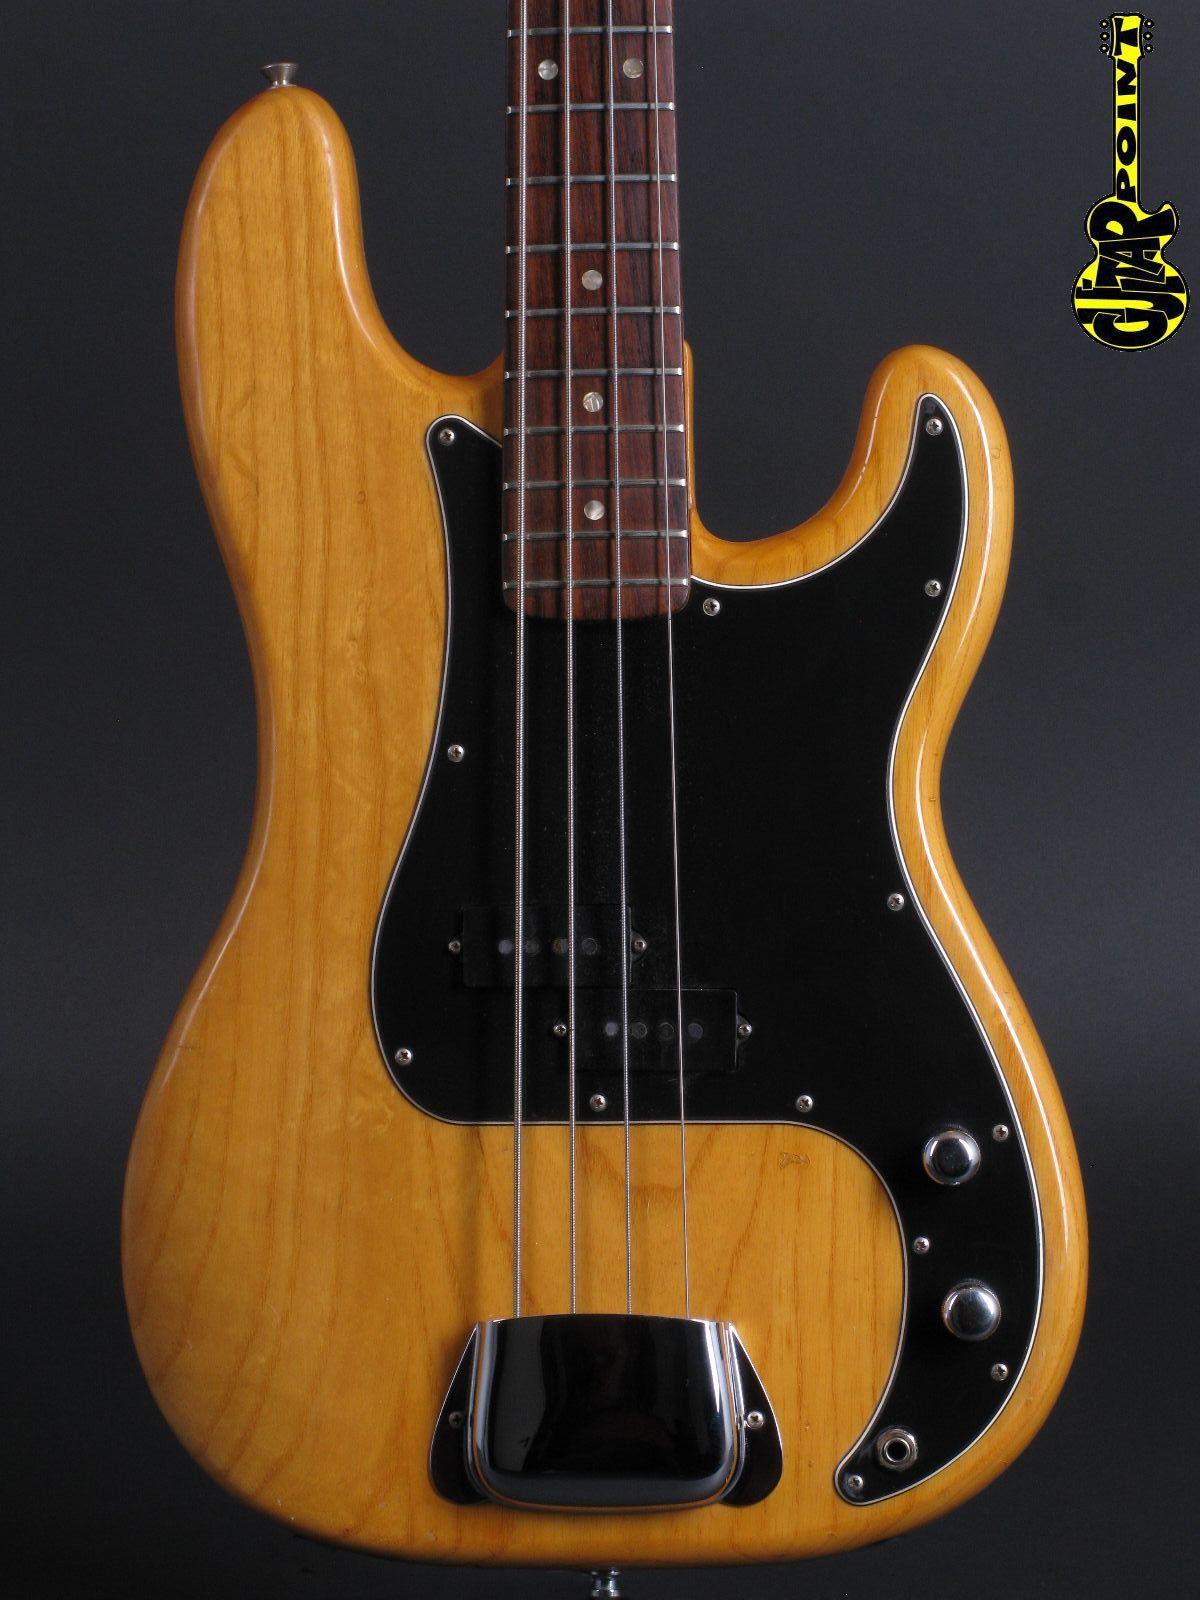 1978 Fender Precision Bass - Natural